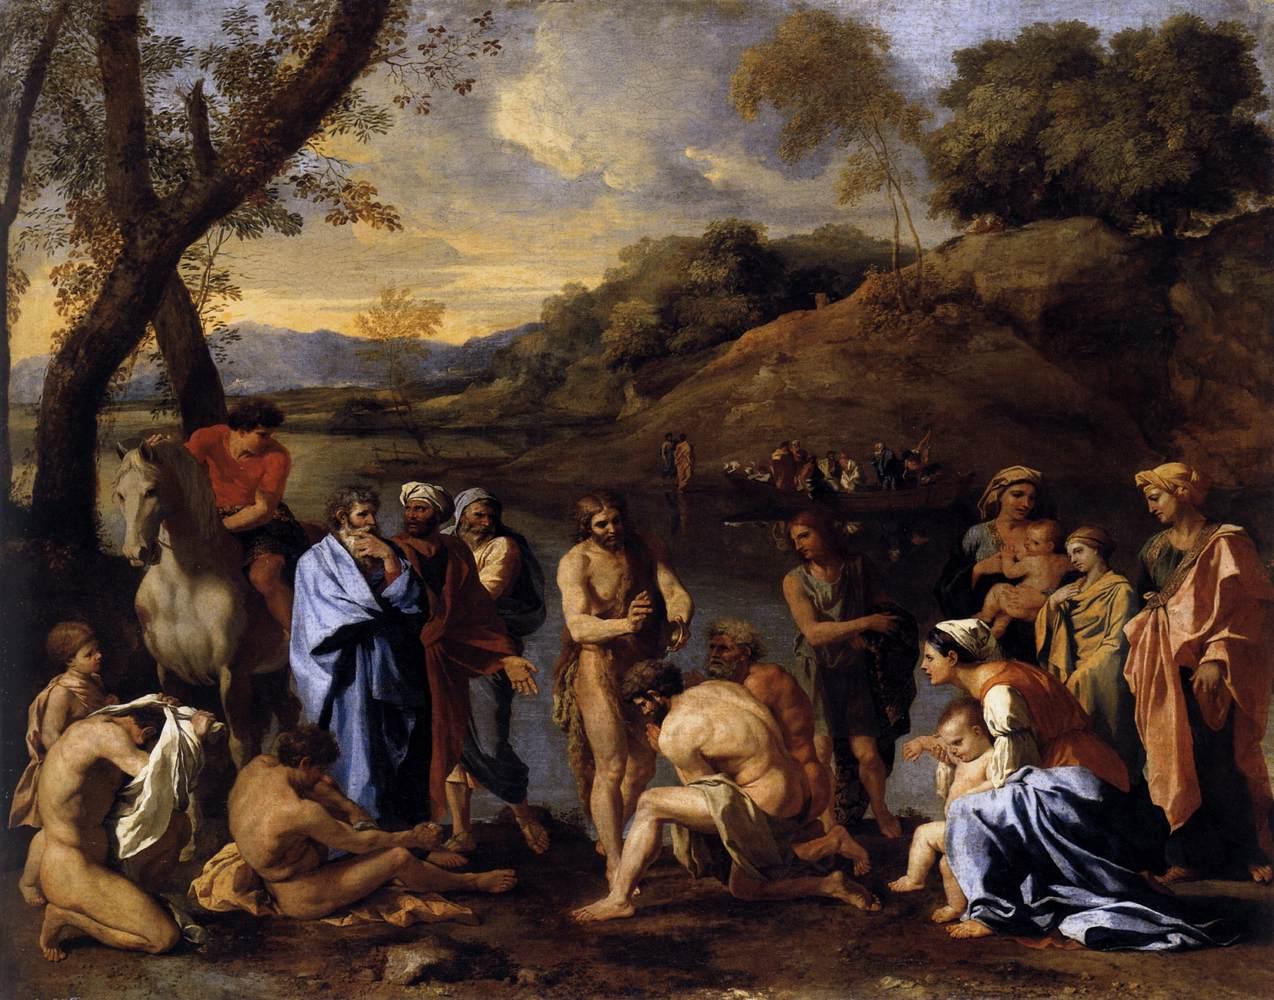 http://2.bp.blogspot.com/_1kAlj_WRhYA/TCAqnTS2biI/AAAAAAAACpY/d-XQXe_AKaI/s1600/St+John+the+Baptist+Baptizes+the+People,+POUSSIN,+Nicolas,+1635.jpg